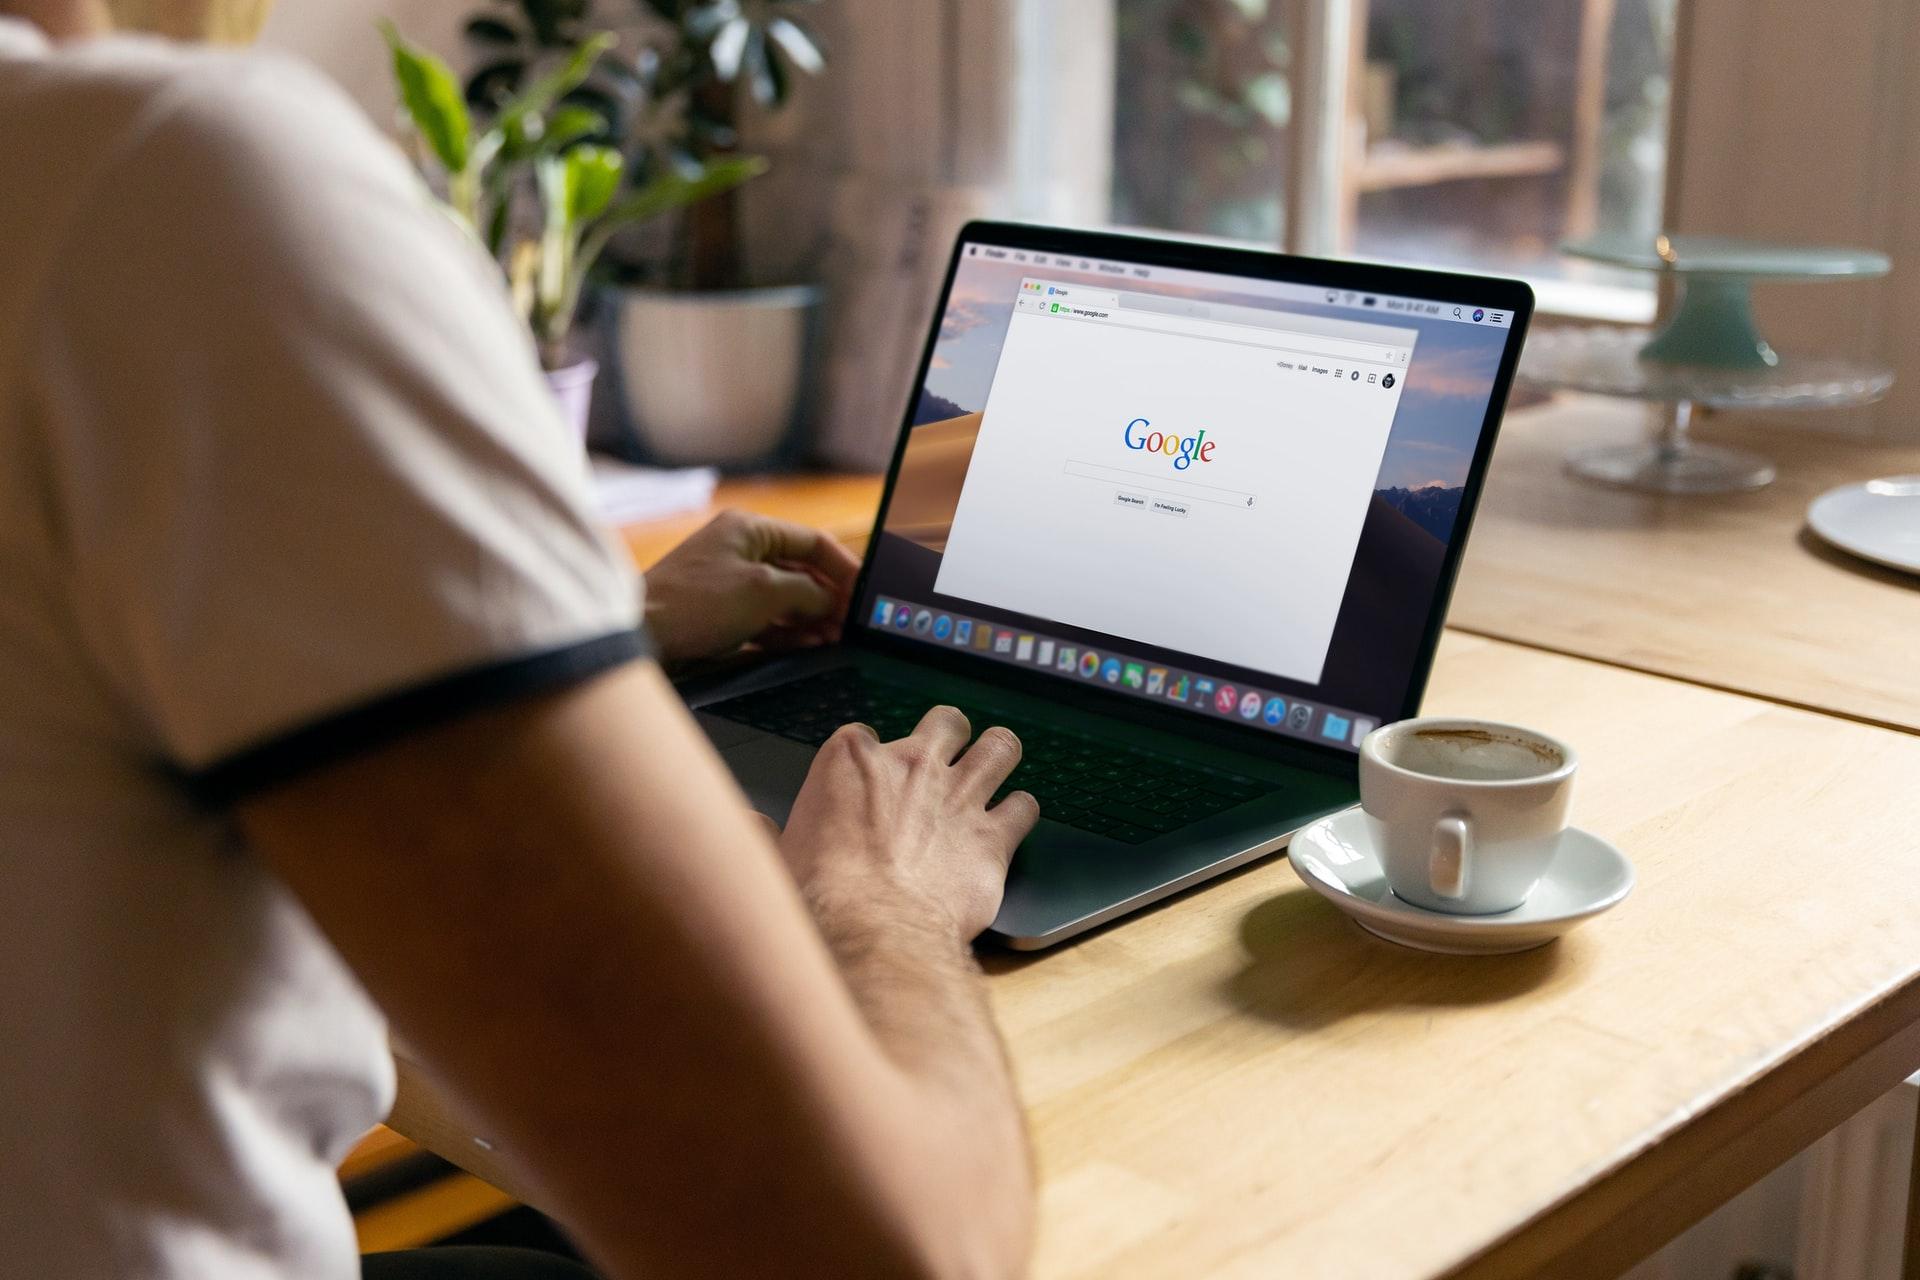 unsplash-google-search